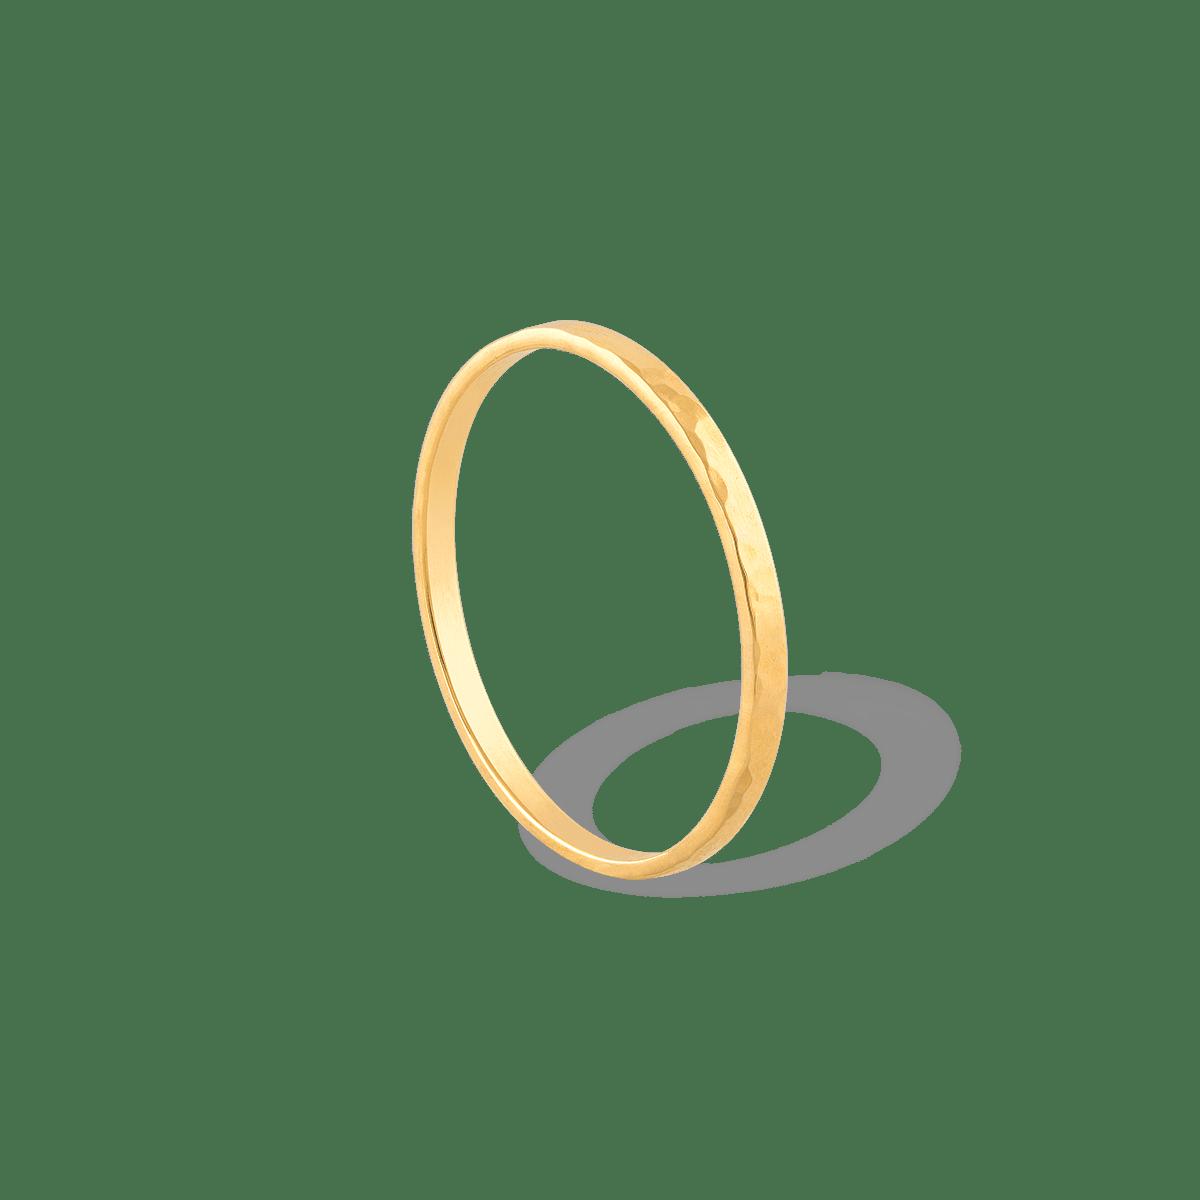 انگشتر طلا هرا